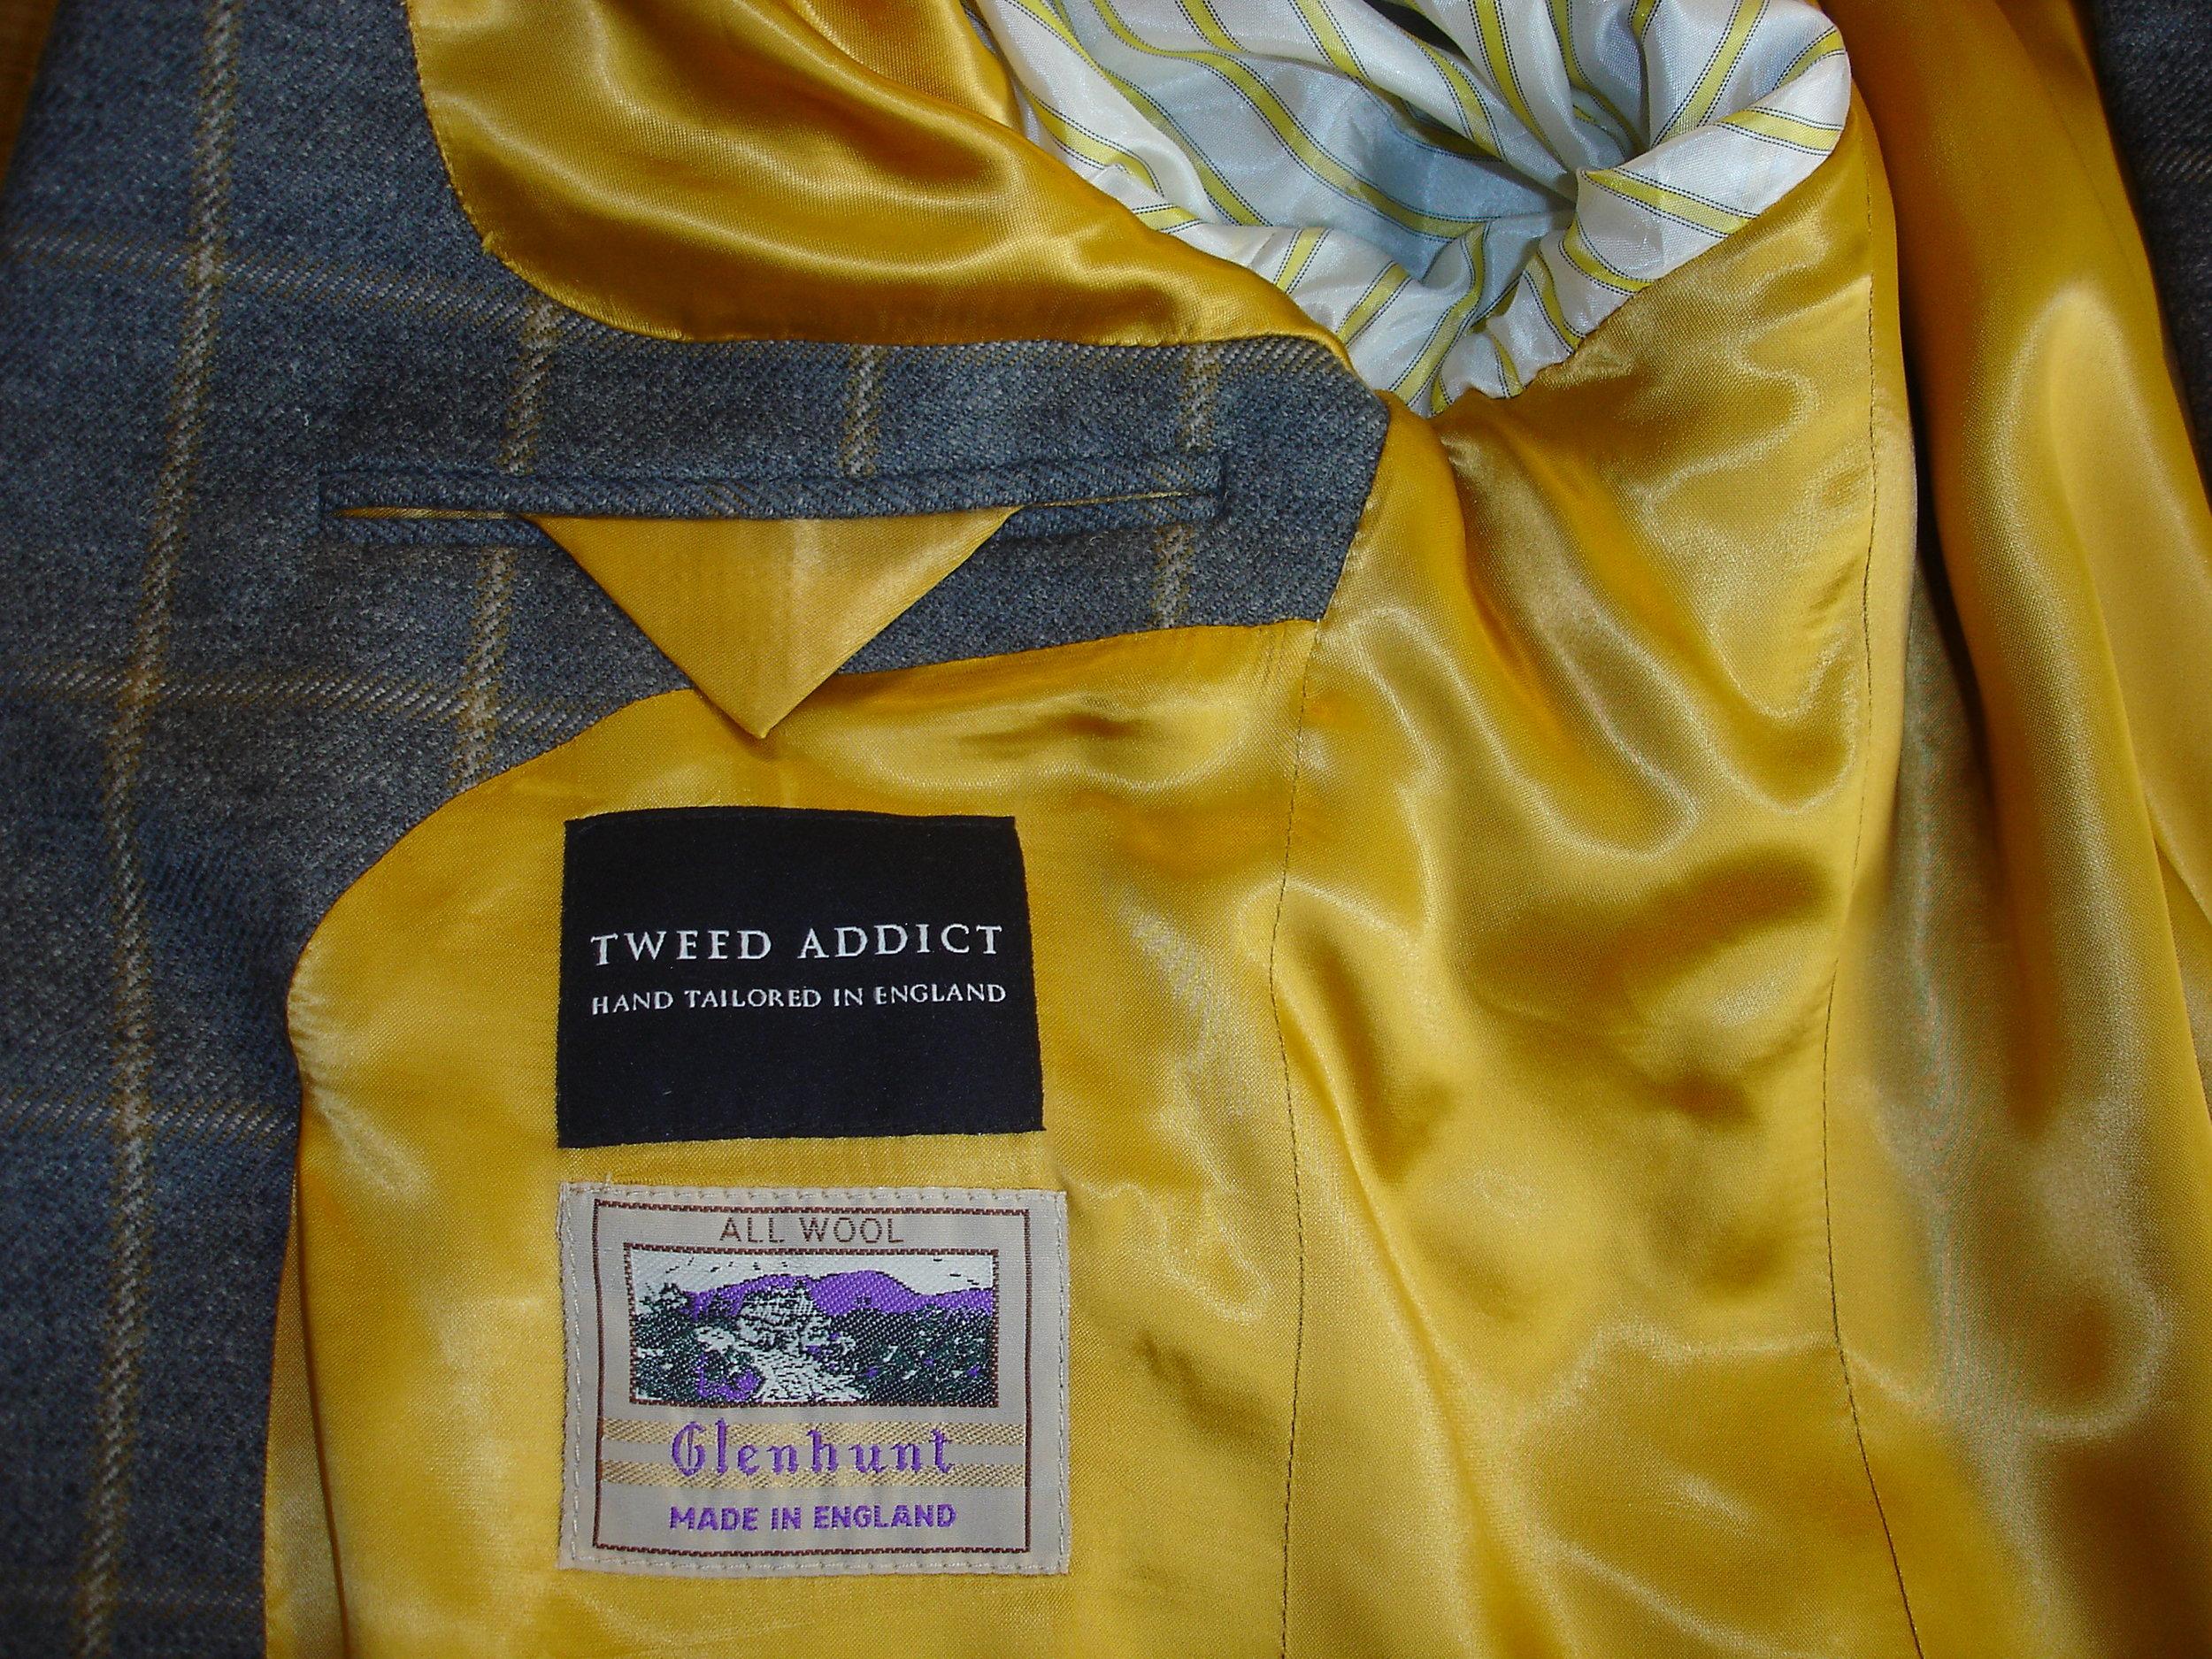 Glenhunt Grey Check 3 Piece Tweed Suit (14).JPG